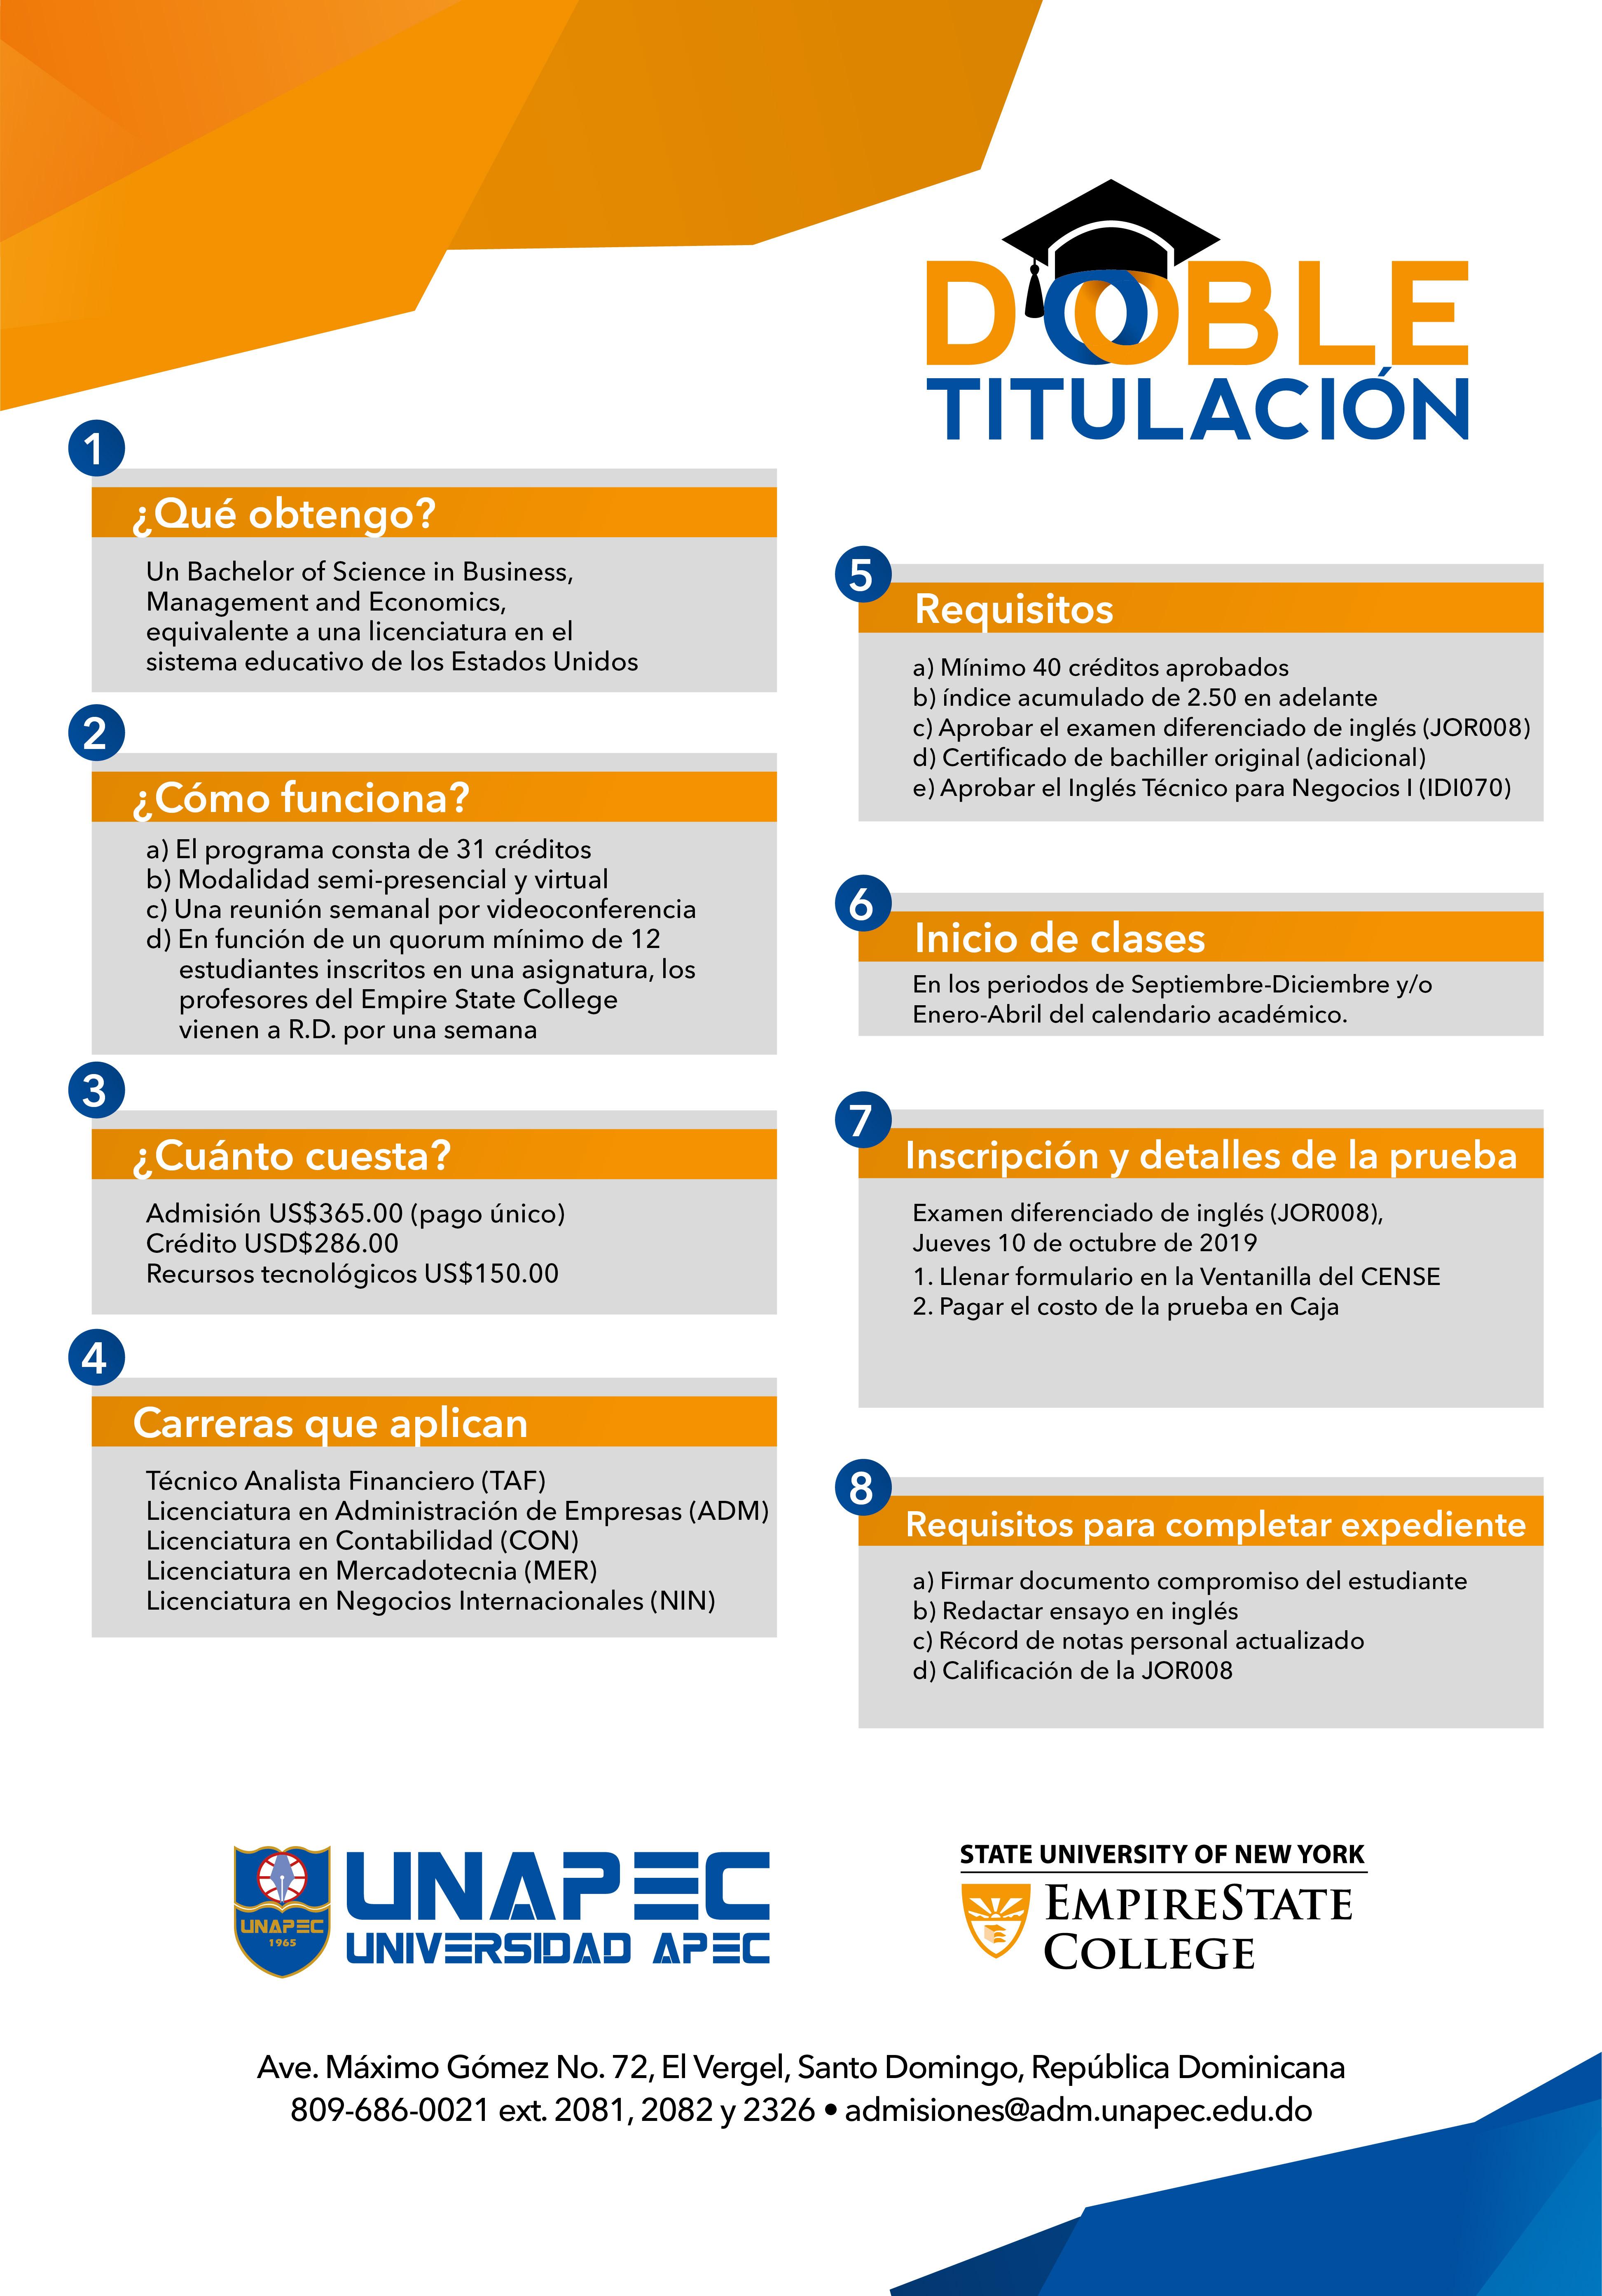 UNAPEC - Portal de Admisiones